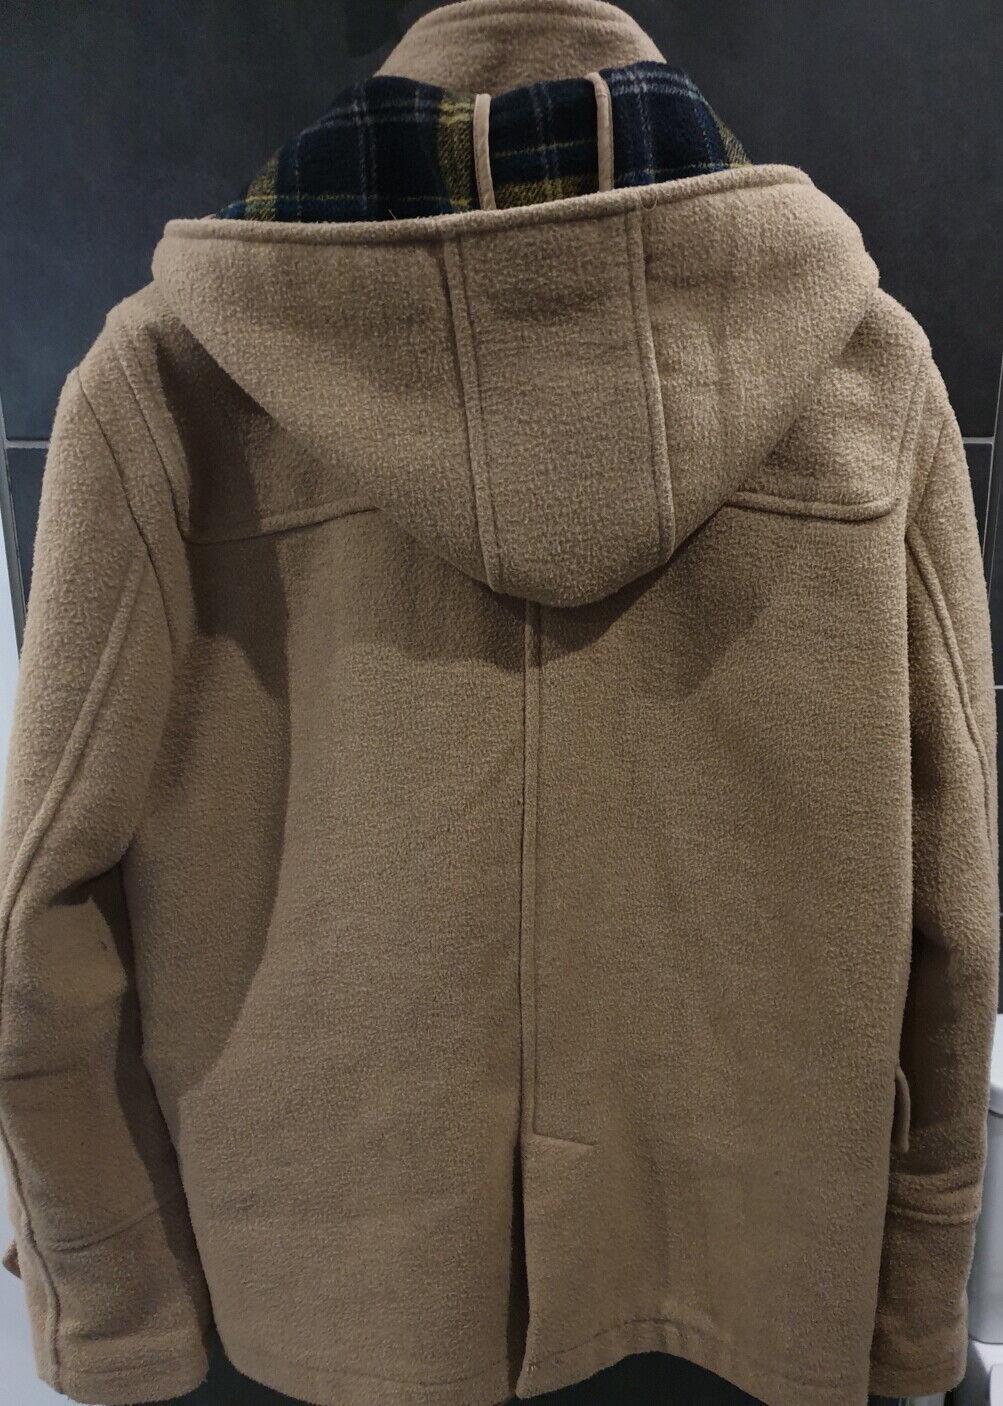 Manteau duffle-coat asos beige t.m